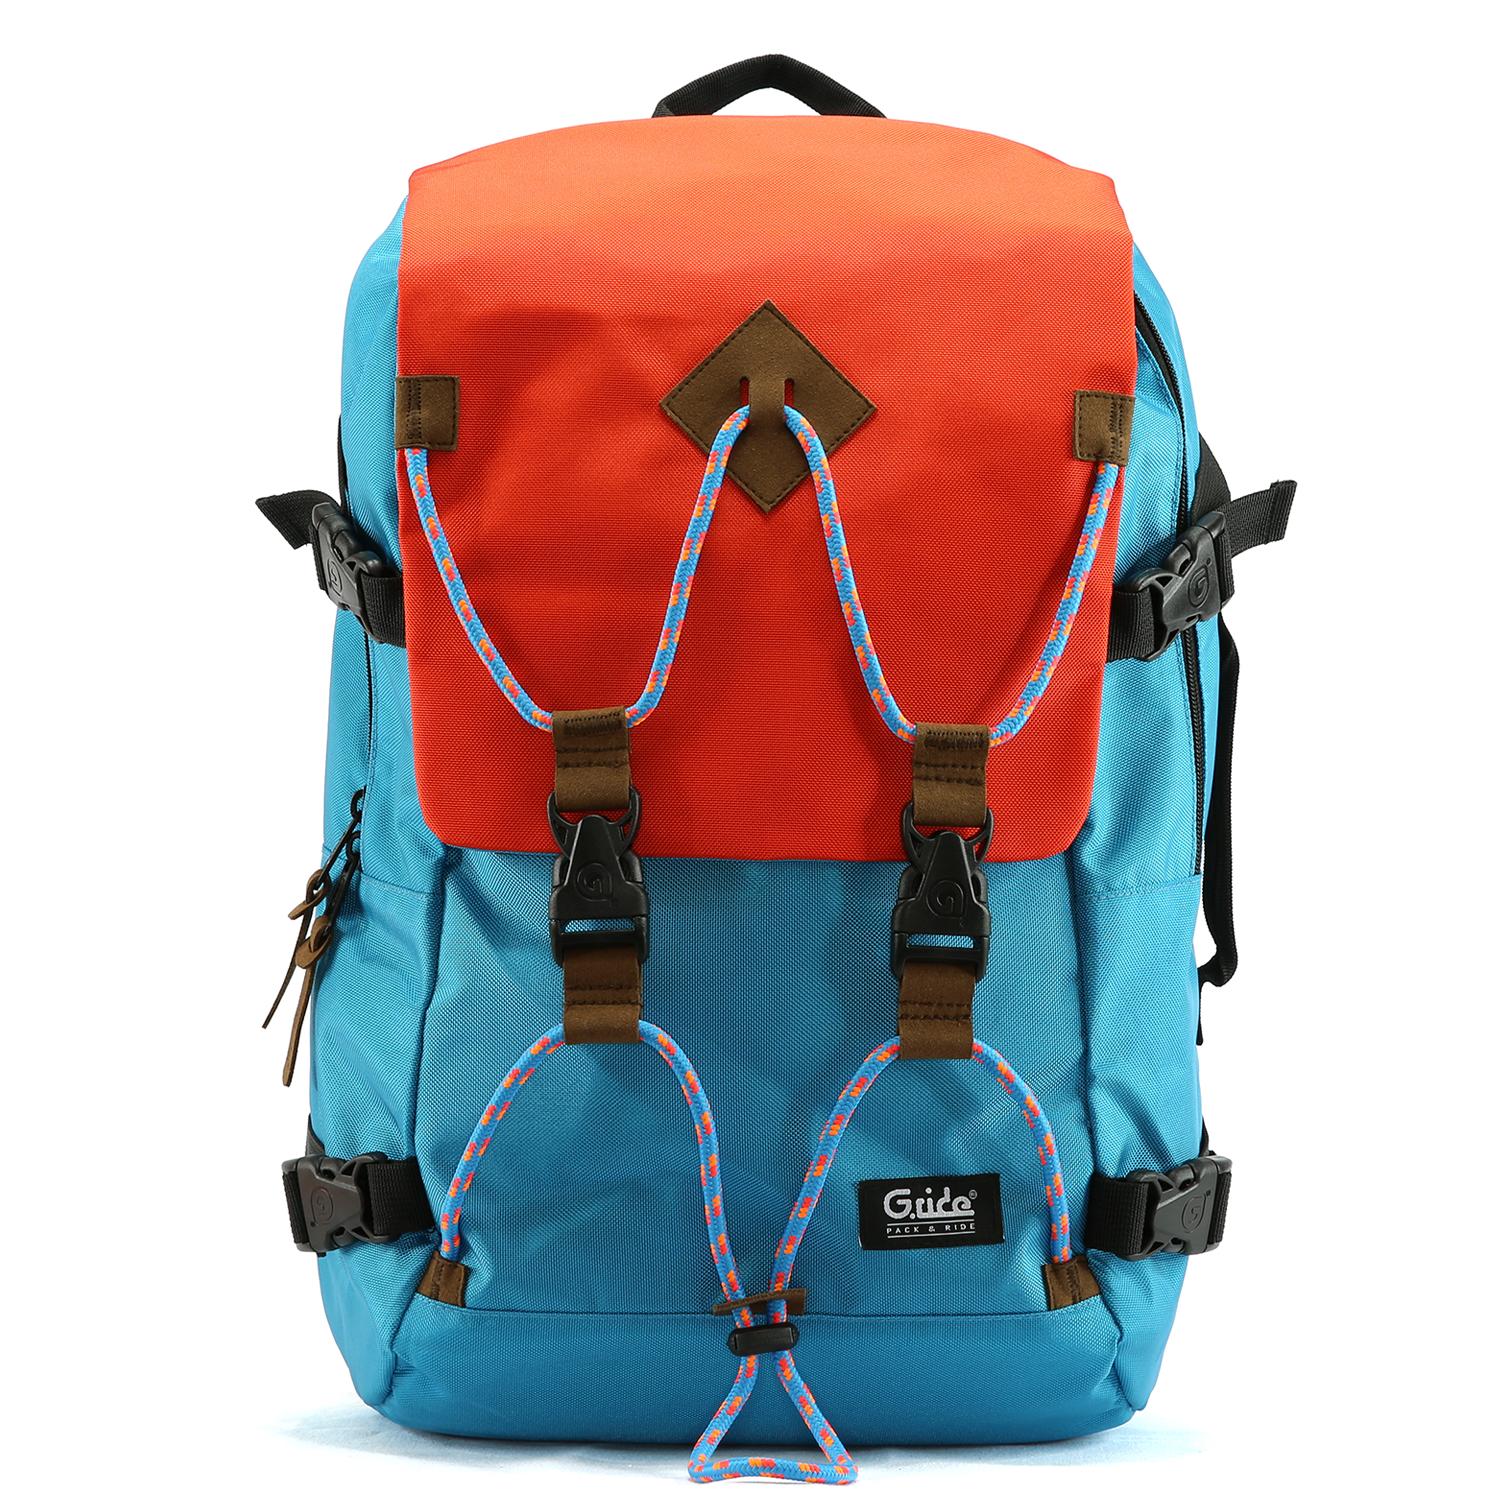 G.RIDE - Τσάντα πλάτης G.Ride μπλε γυναικεία αξεσουάρ τσάντες σακίδια πλάτης